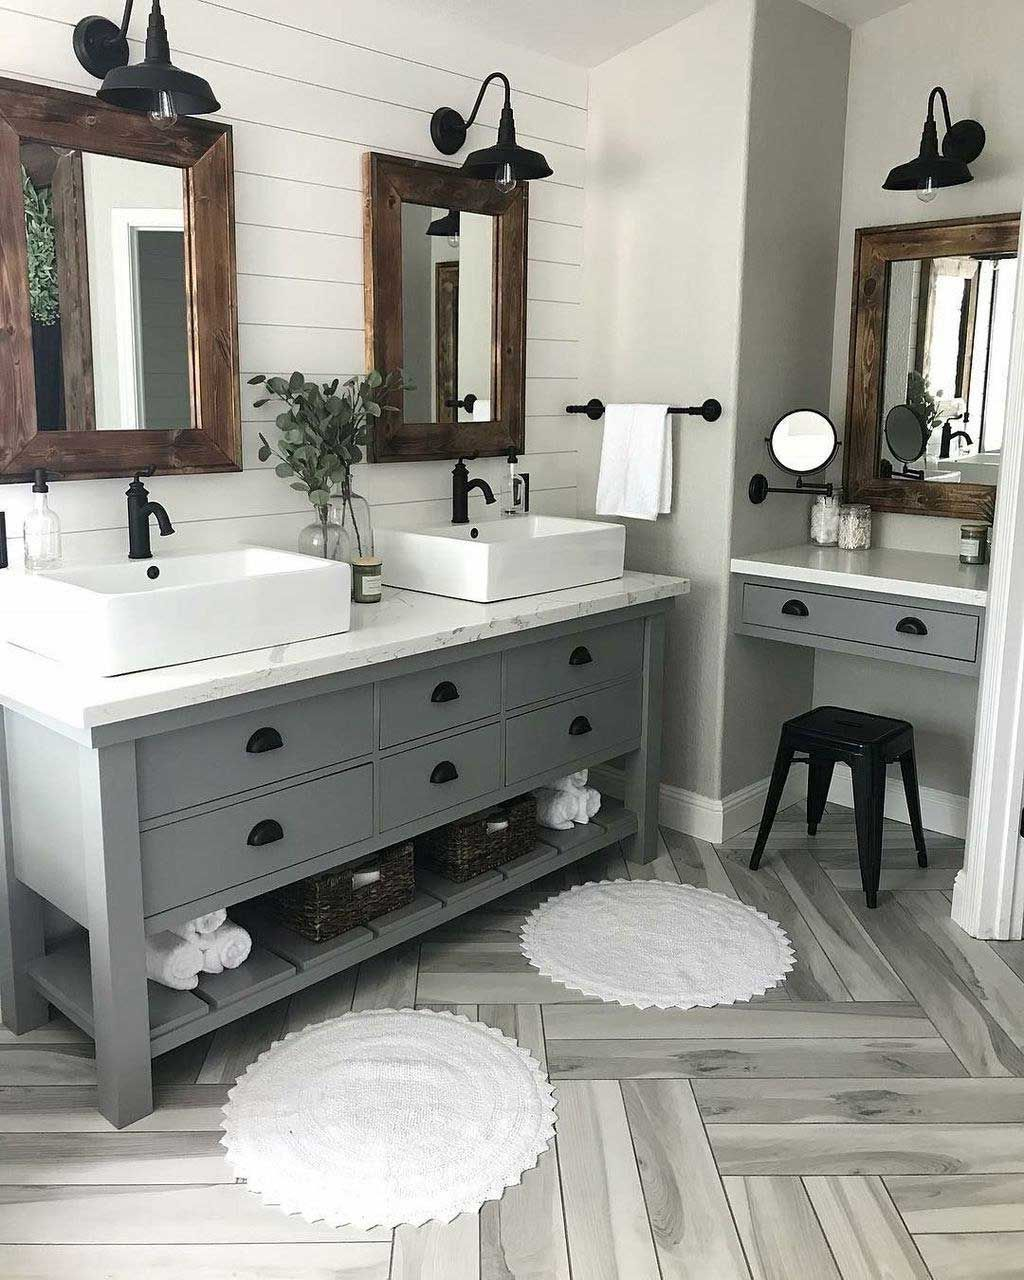 44 Low Cost Farmhouse Bathroom Design Ideas 15 With Lamp Decor Bathroom Cost Deco Beautiful Bathroom Vanity Bathroom Remodel Master Farmhouse Bathroom Vanity